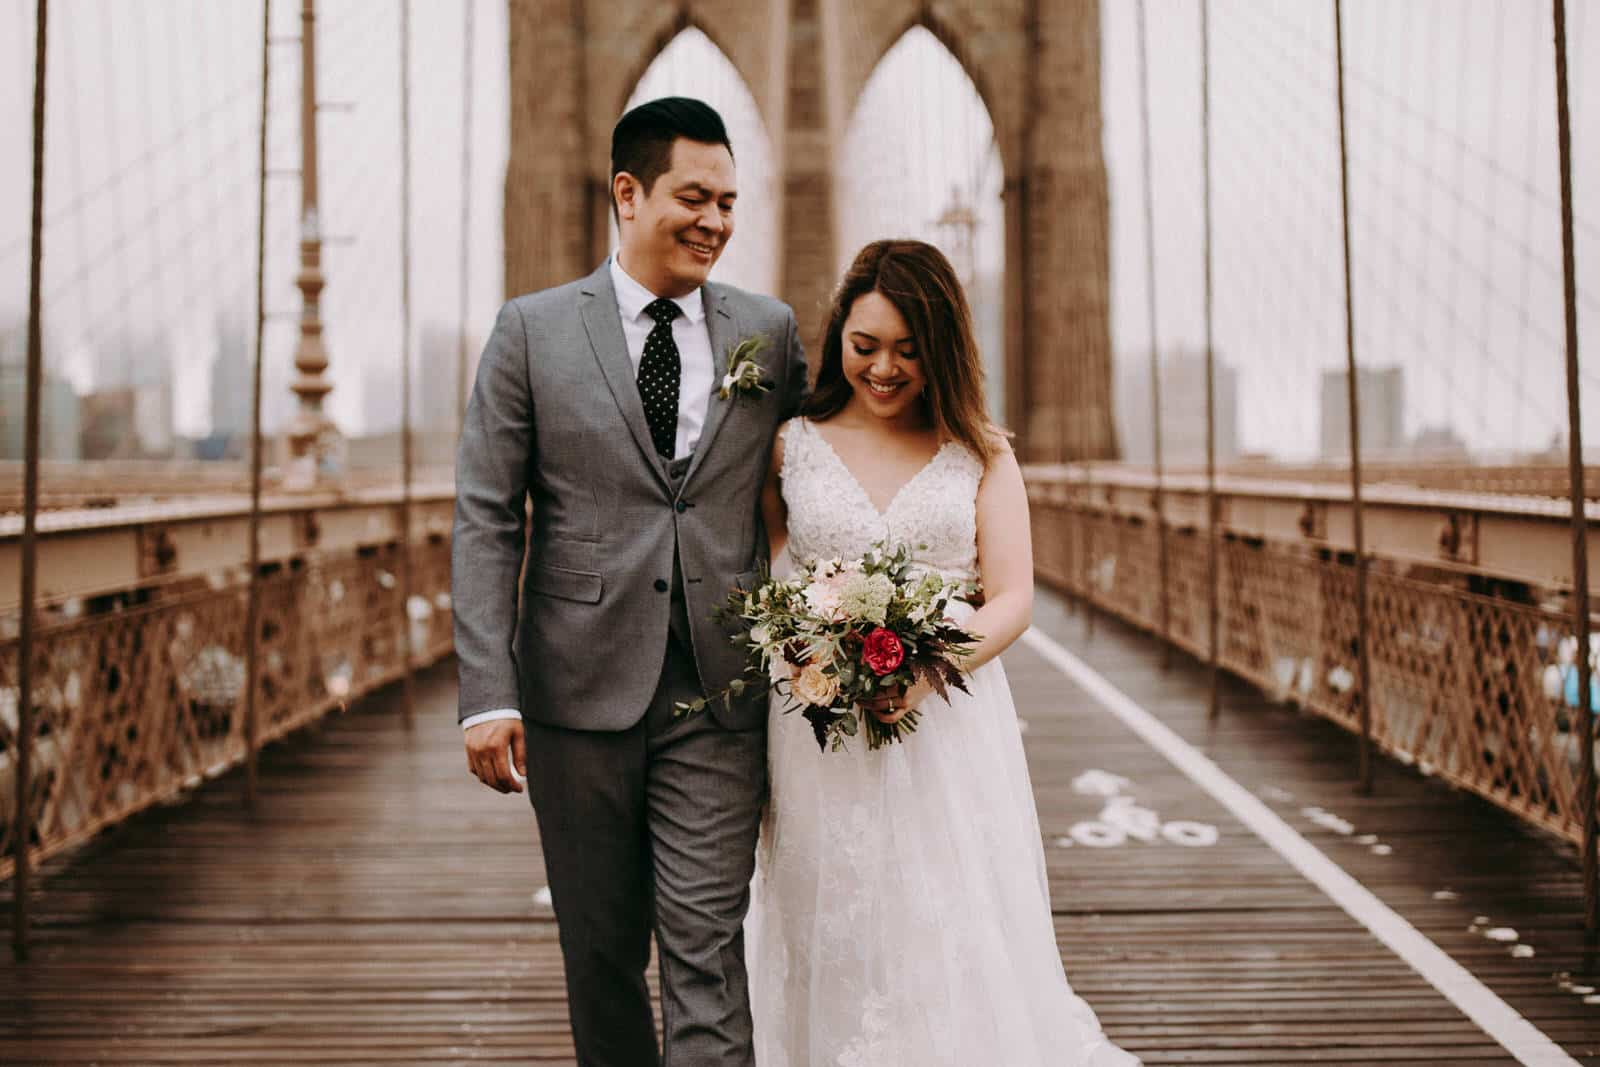 The wedding couple is walking along the Brooklyn Bridge.